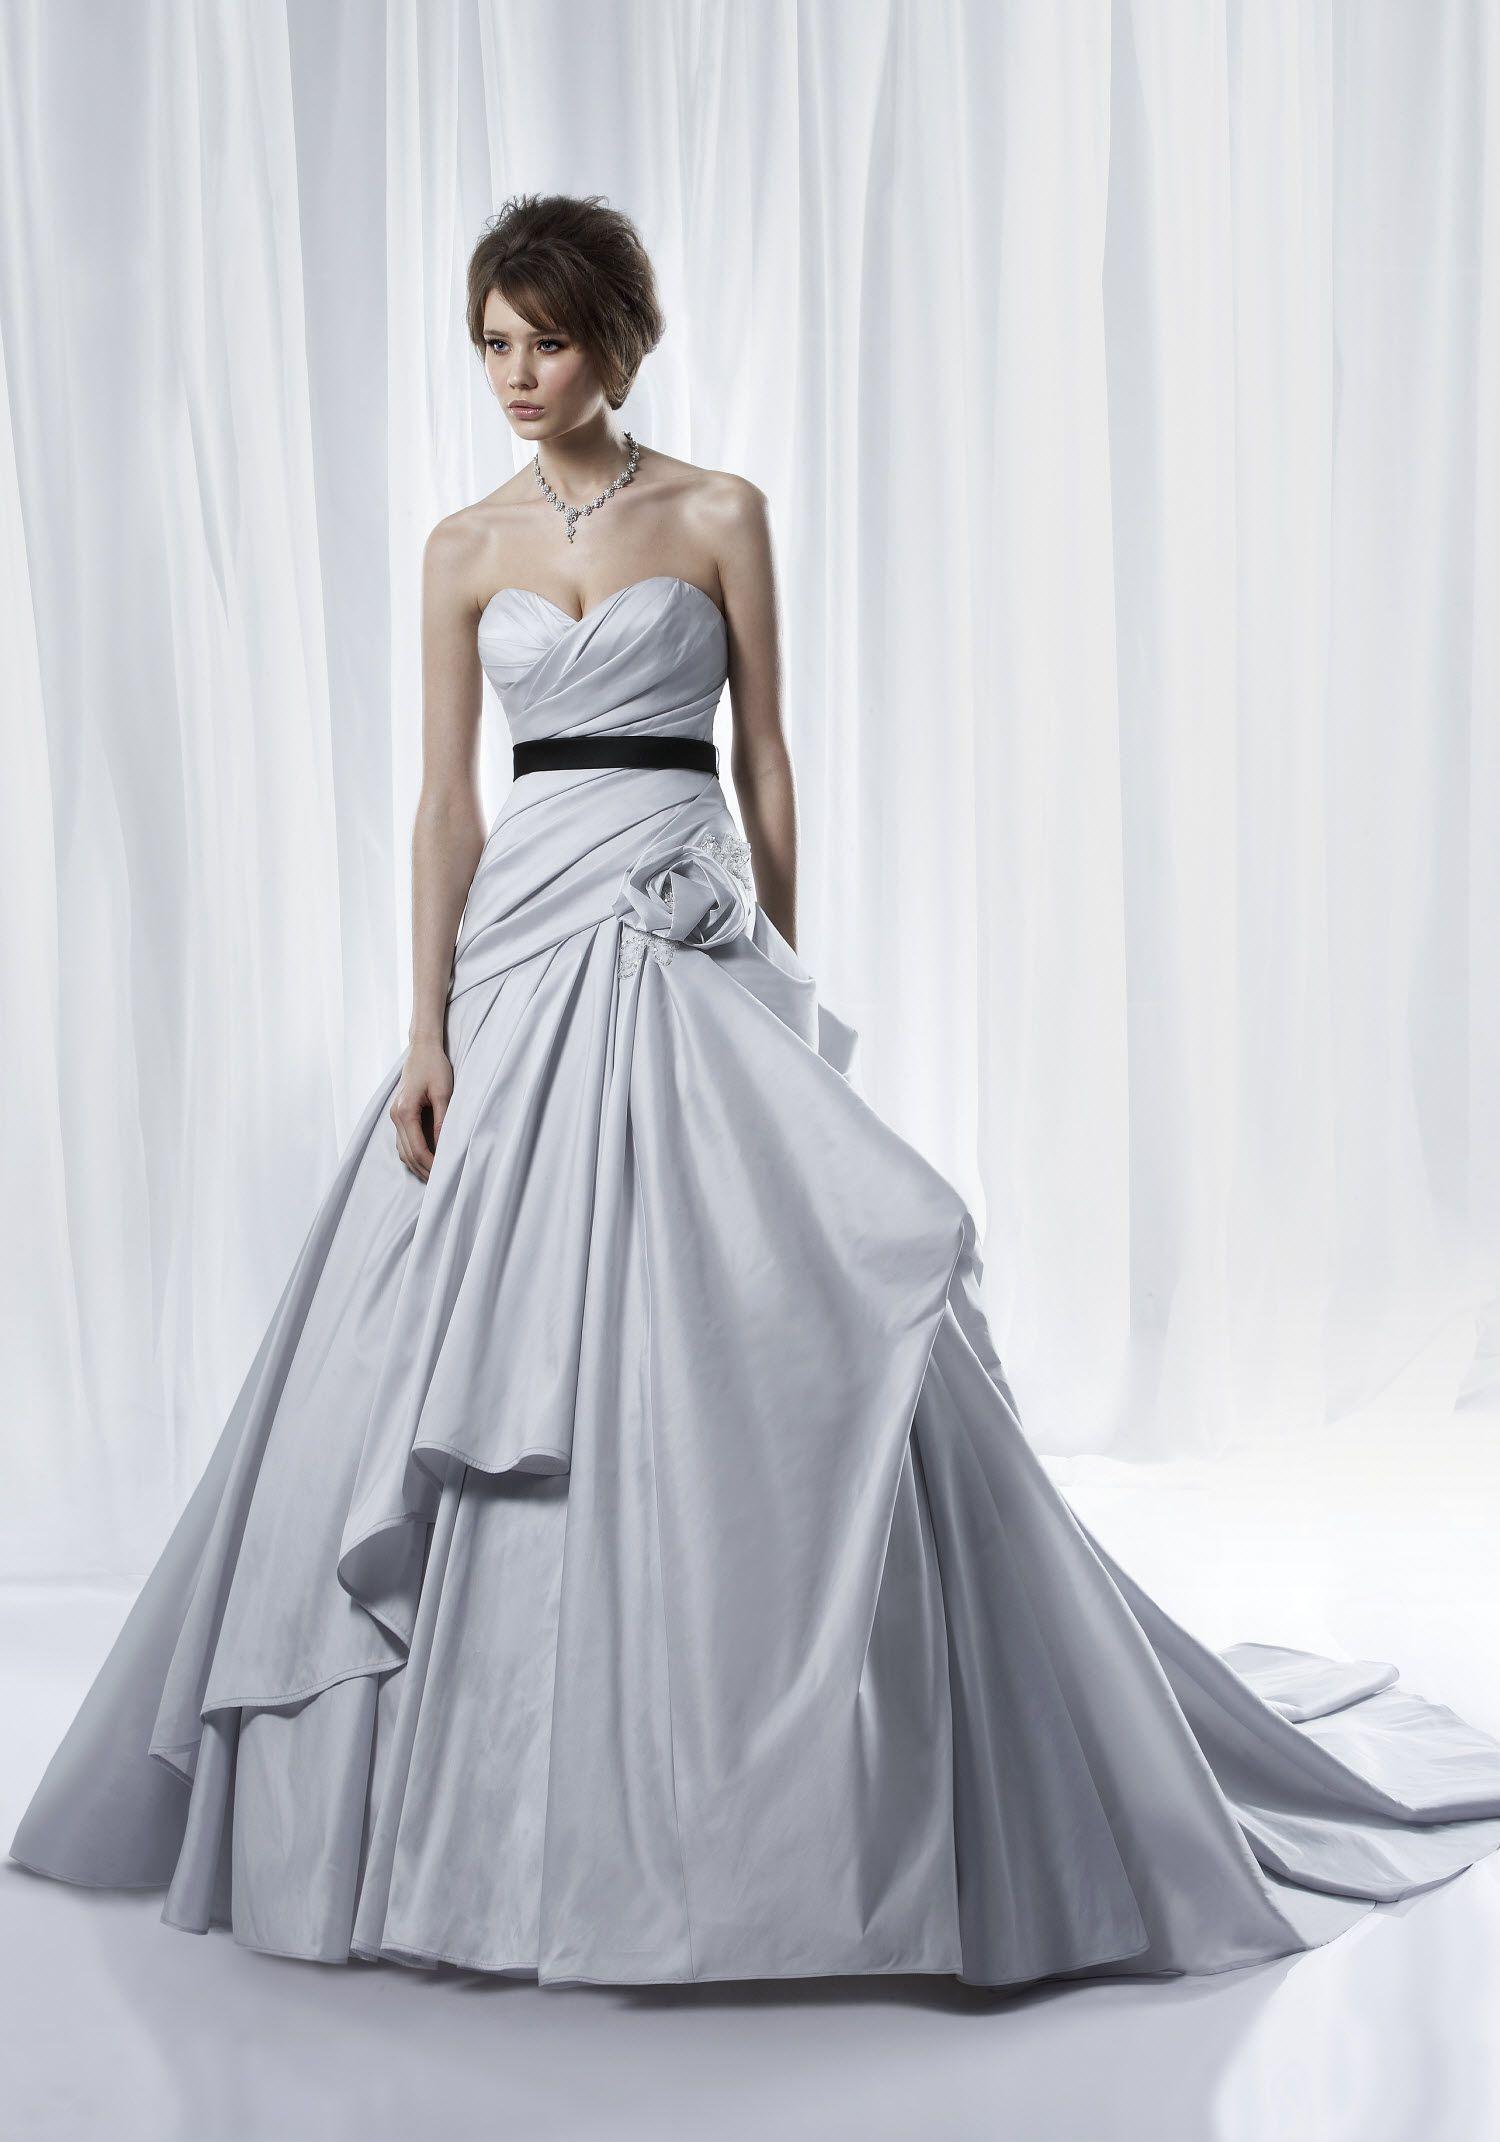 Non white dove grey ballgown wedding dress with modern bustle and non white dove grey ballgown wedding dress with modern bustle and black bridal sash ombrellifo Gallery